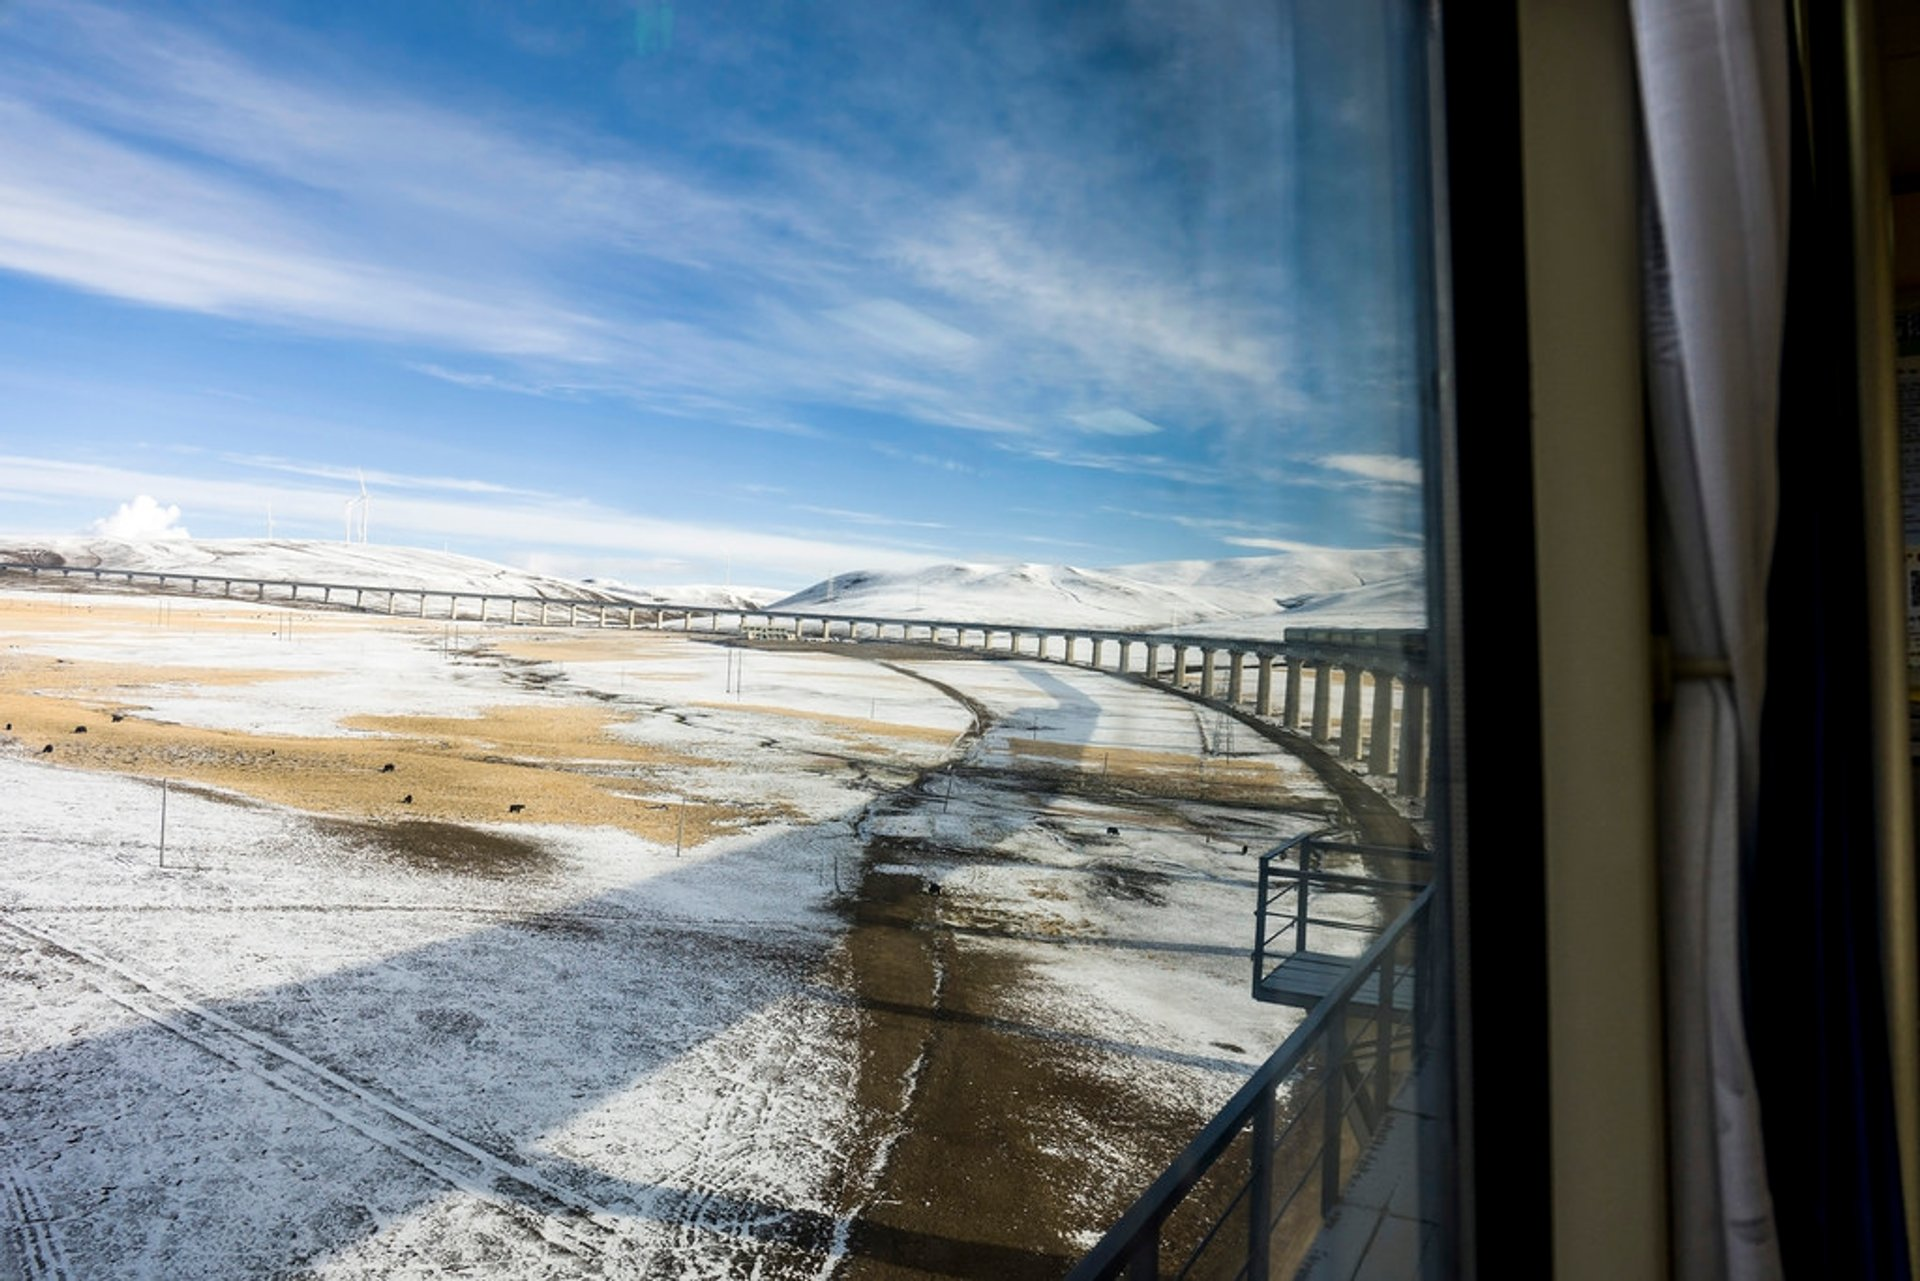 Qinghai-Tibet Railway in Tibet - Best Season 2019